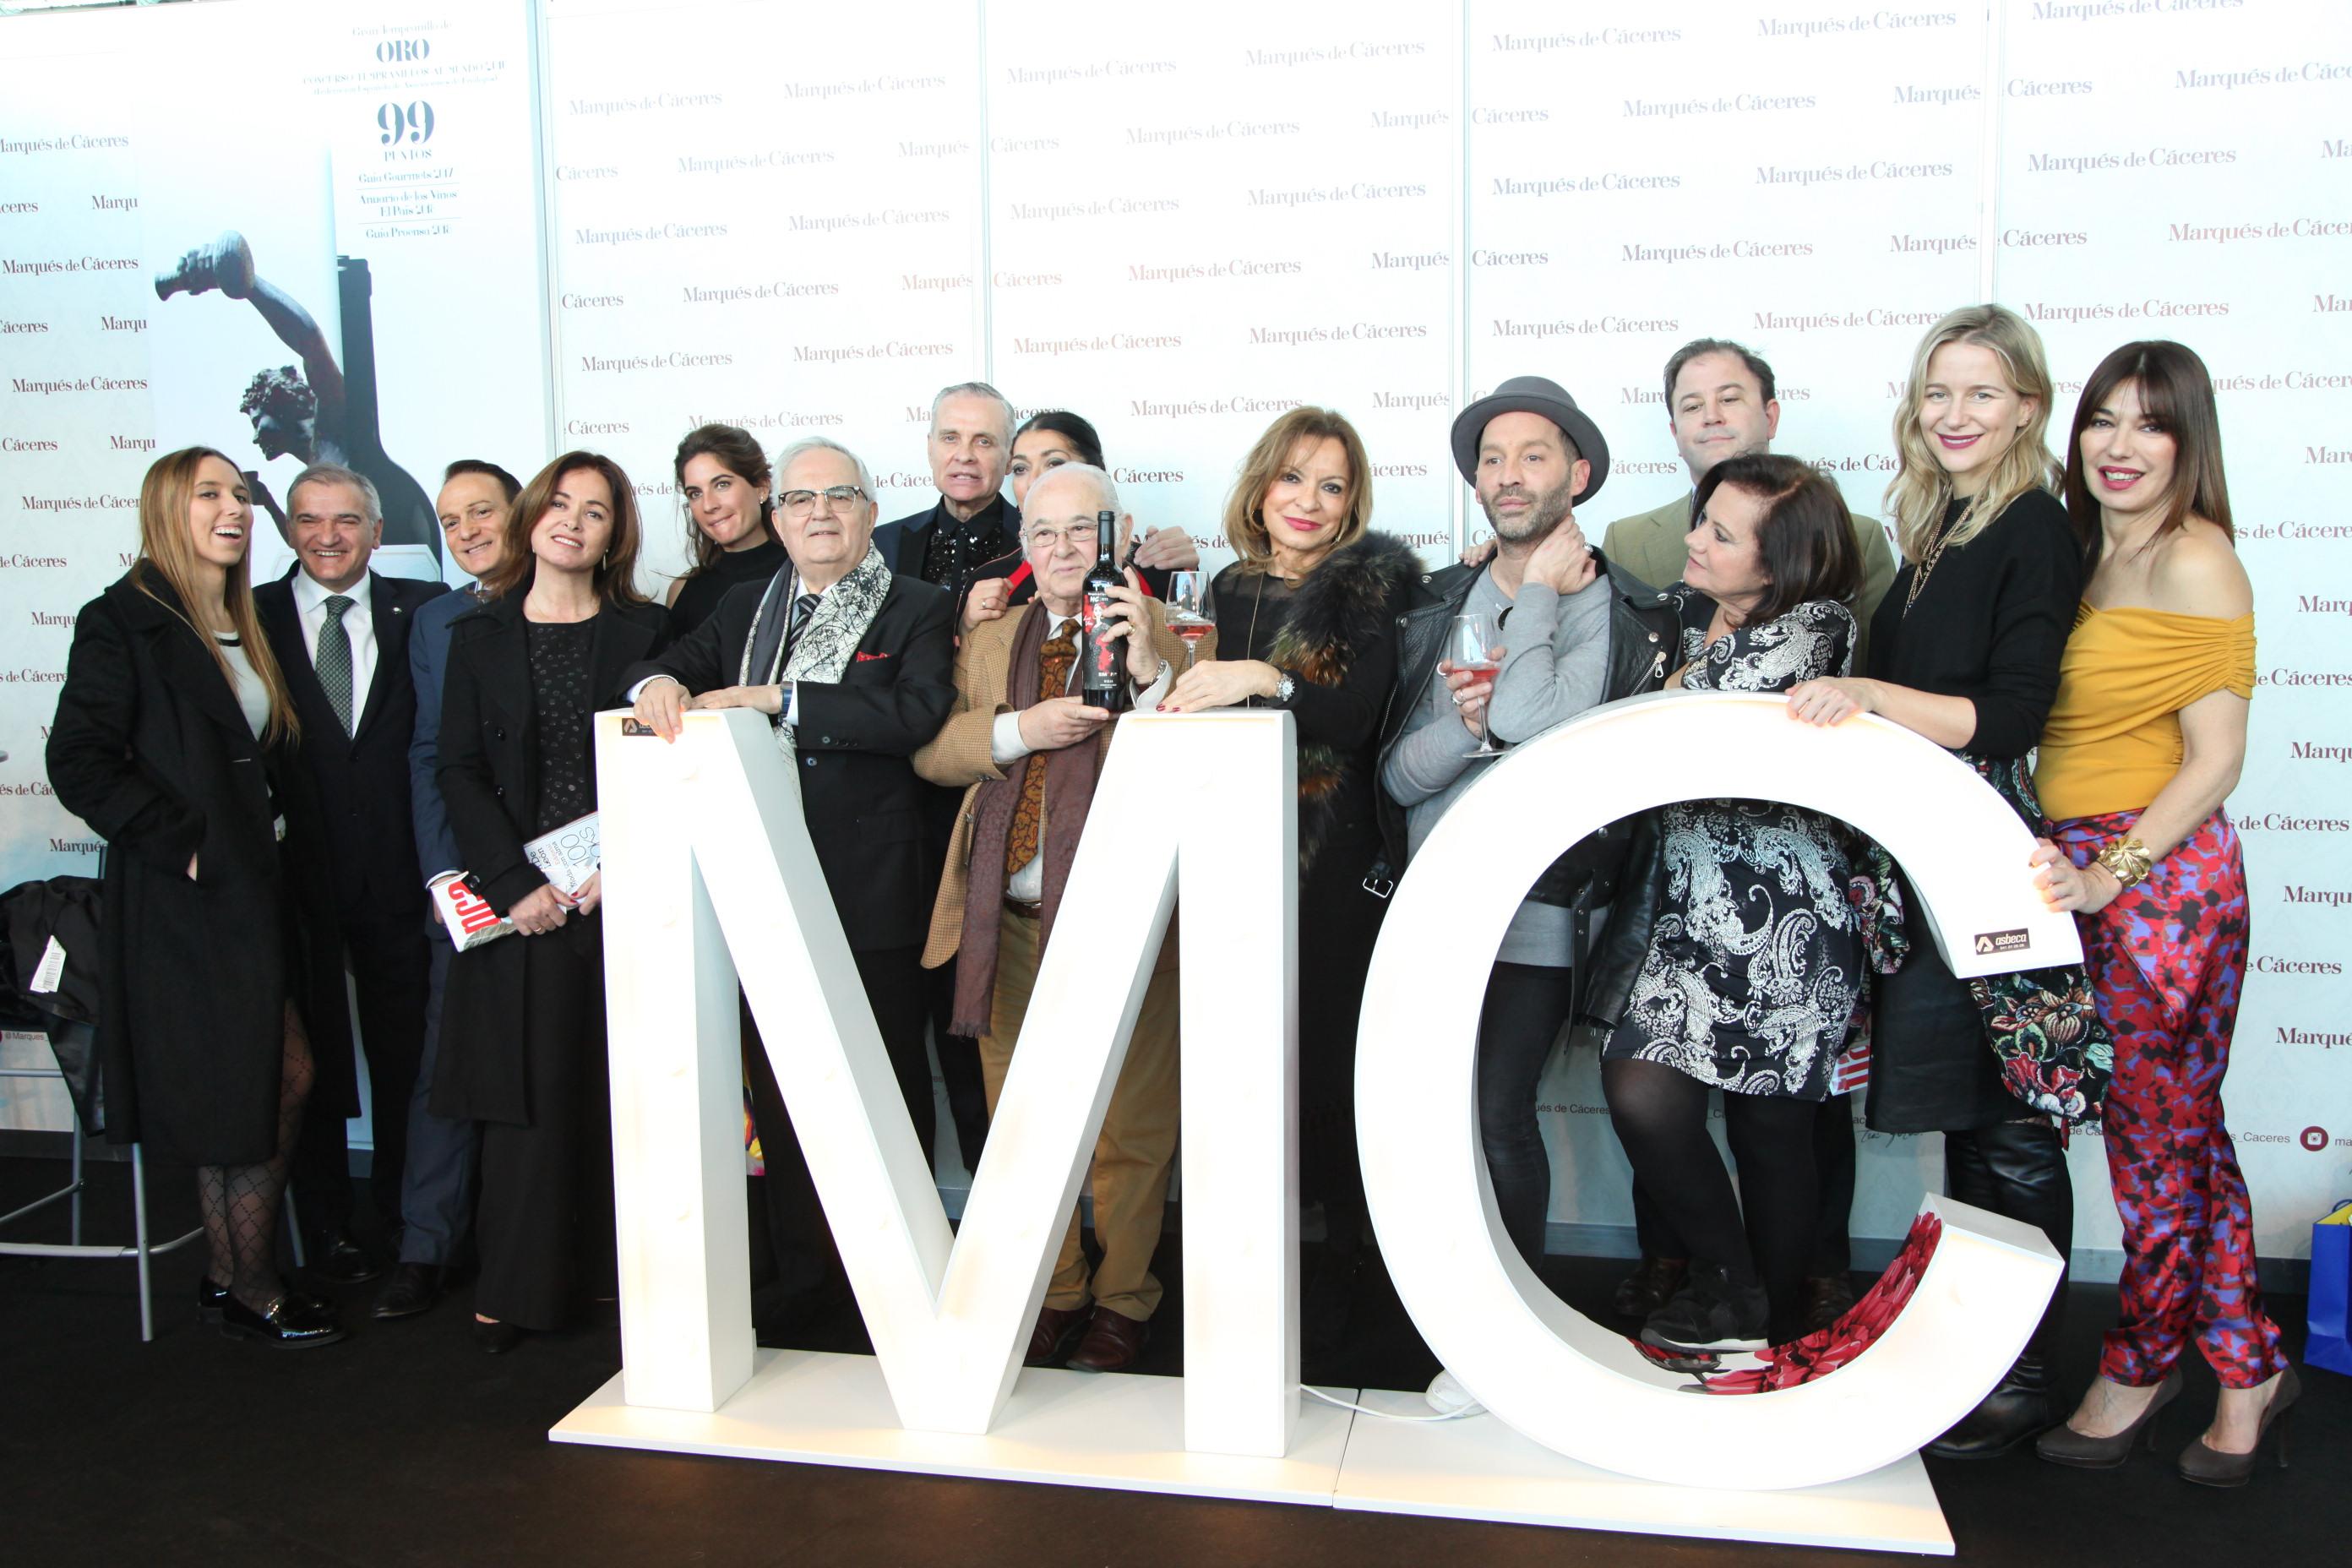 Miembros del jurado del Certamen de Diseñadores noveles SIMOF 2018